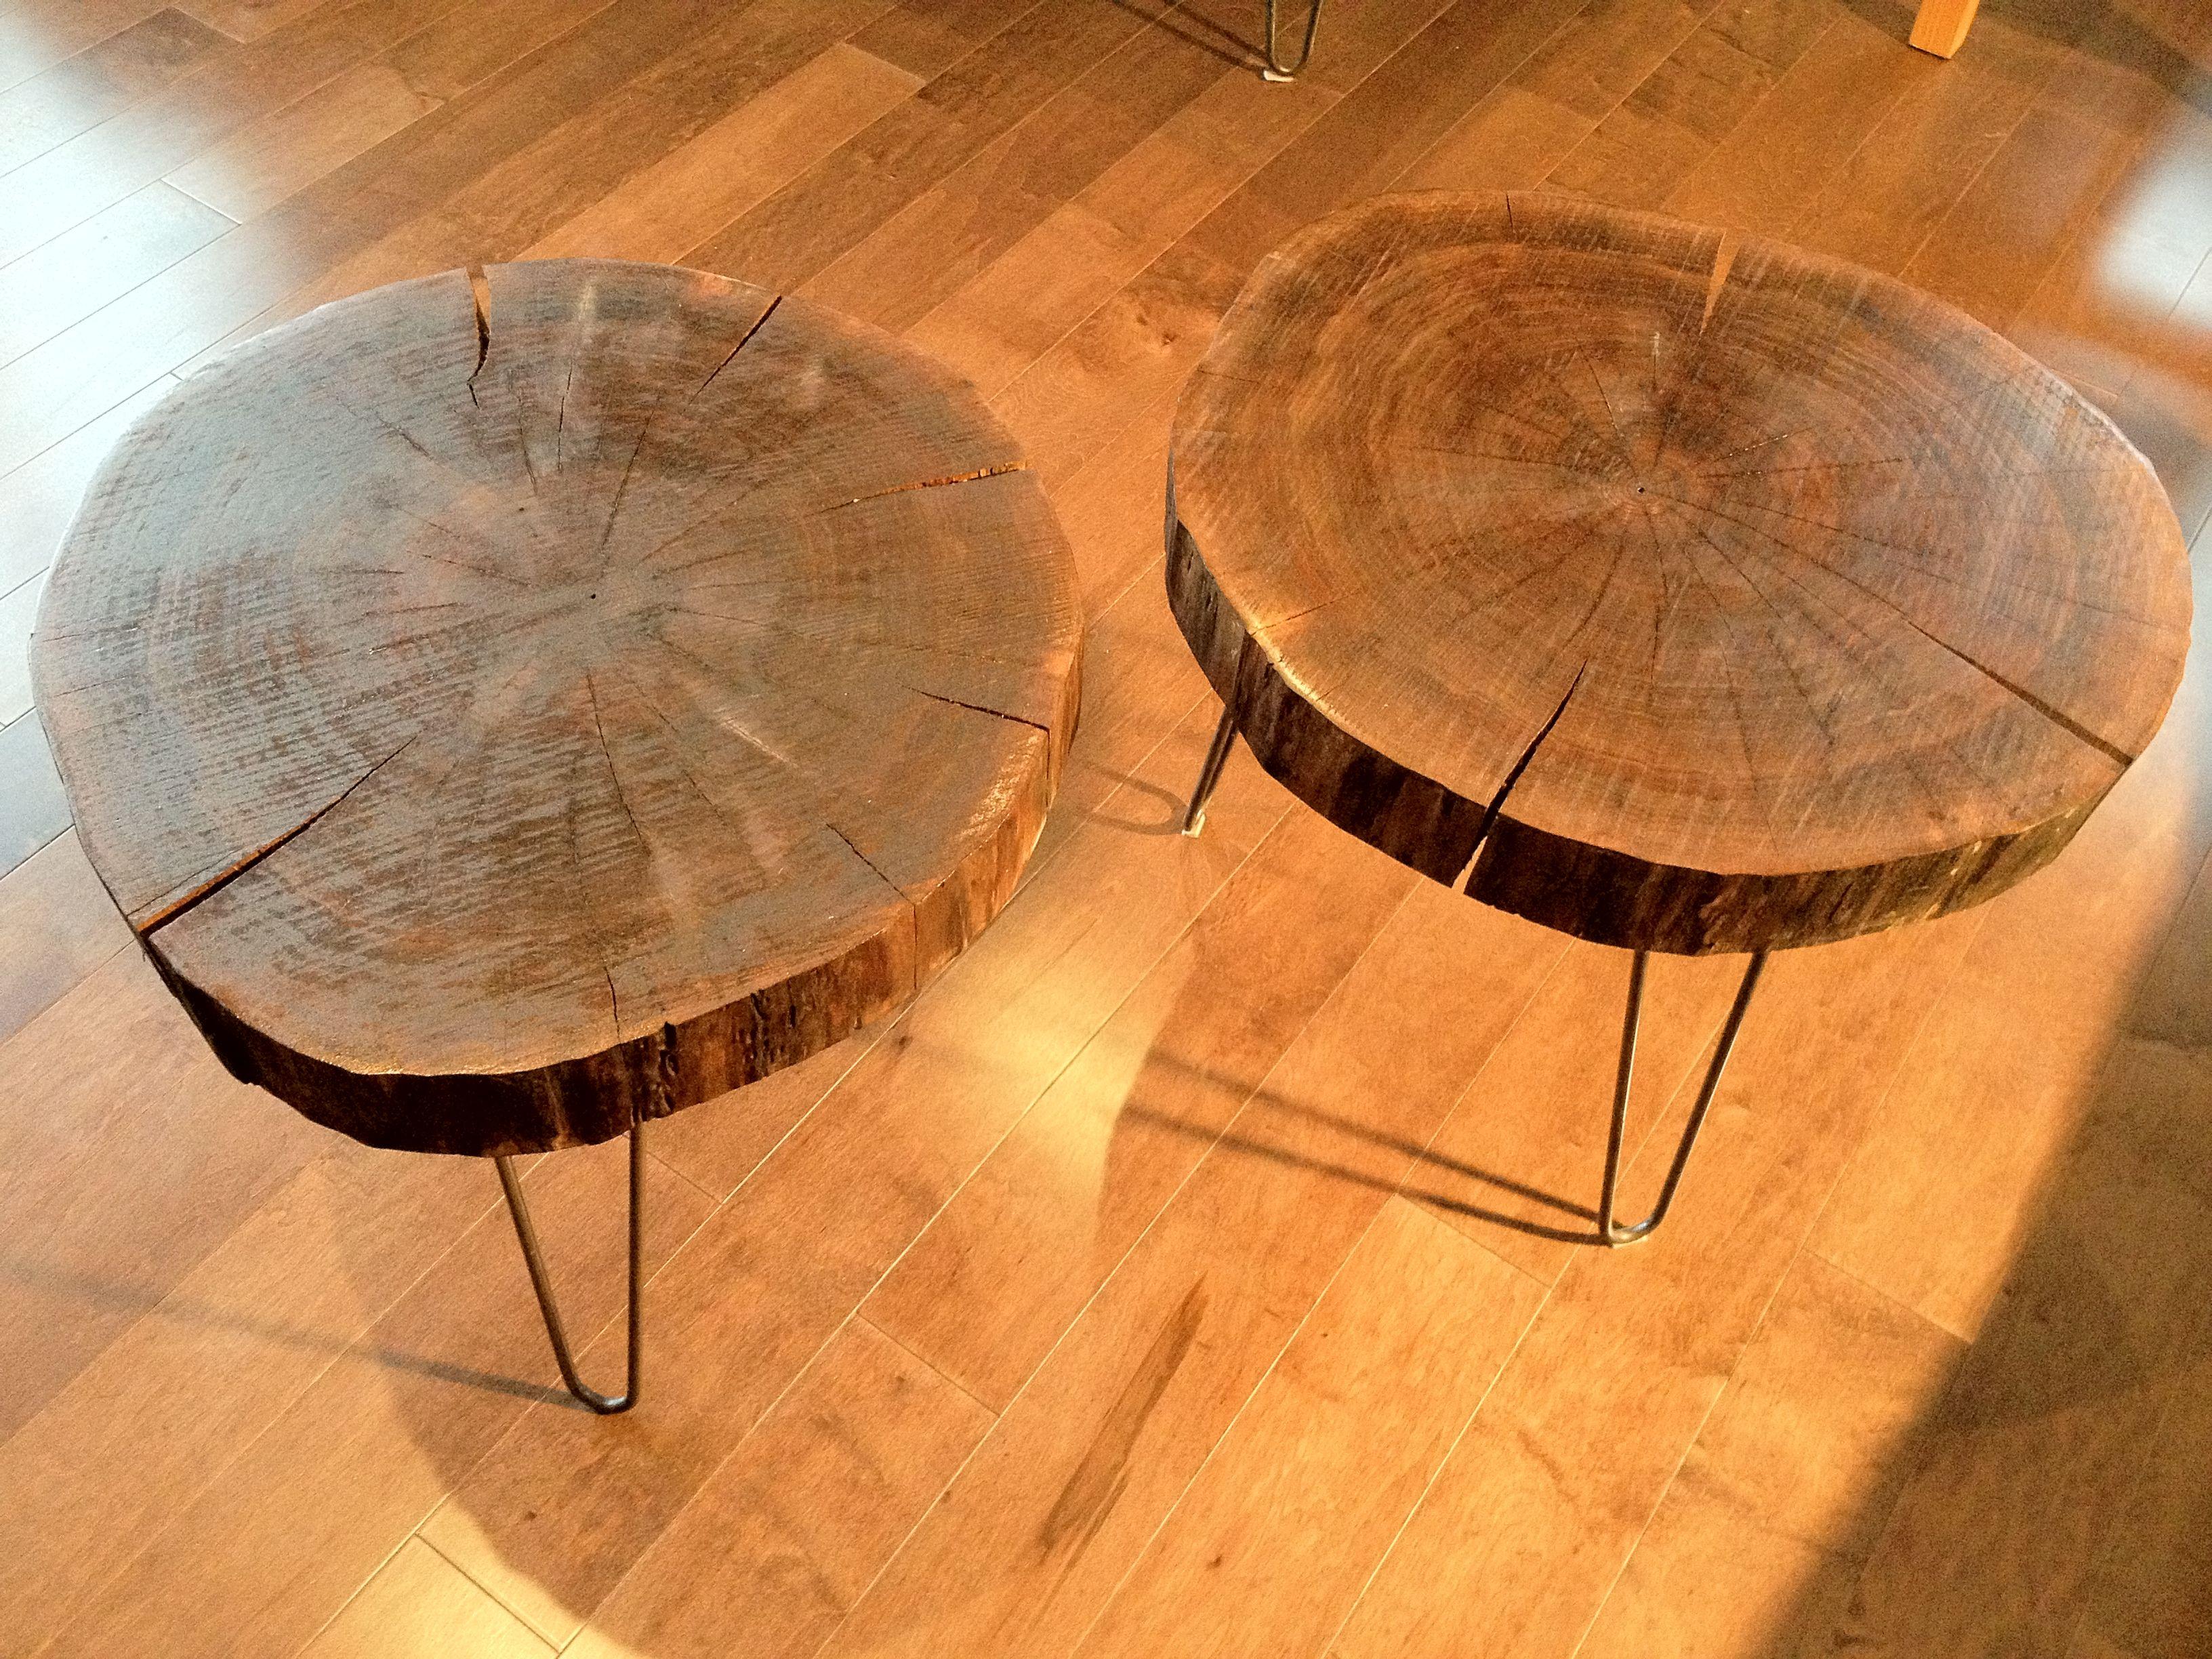 Walnut Round 24 x 24 x 19 H sit on mid century hairpin legs